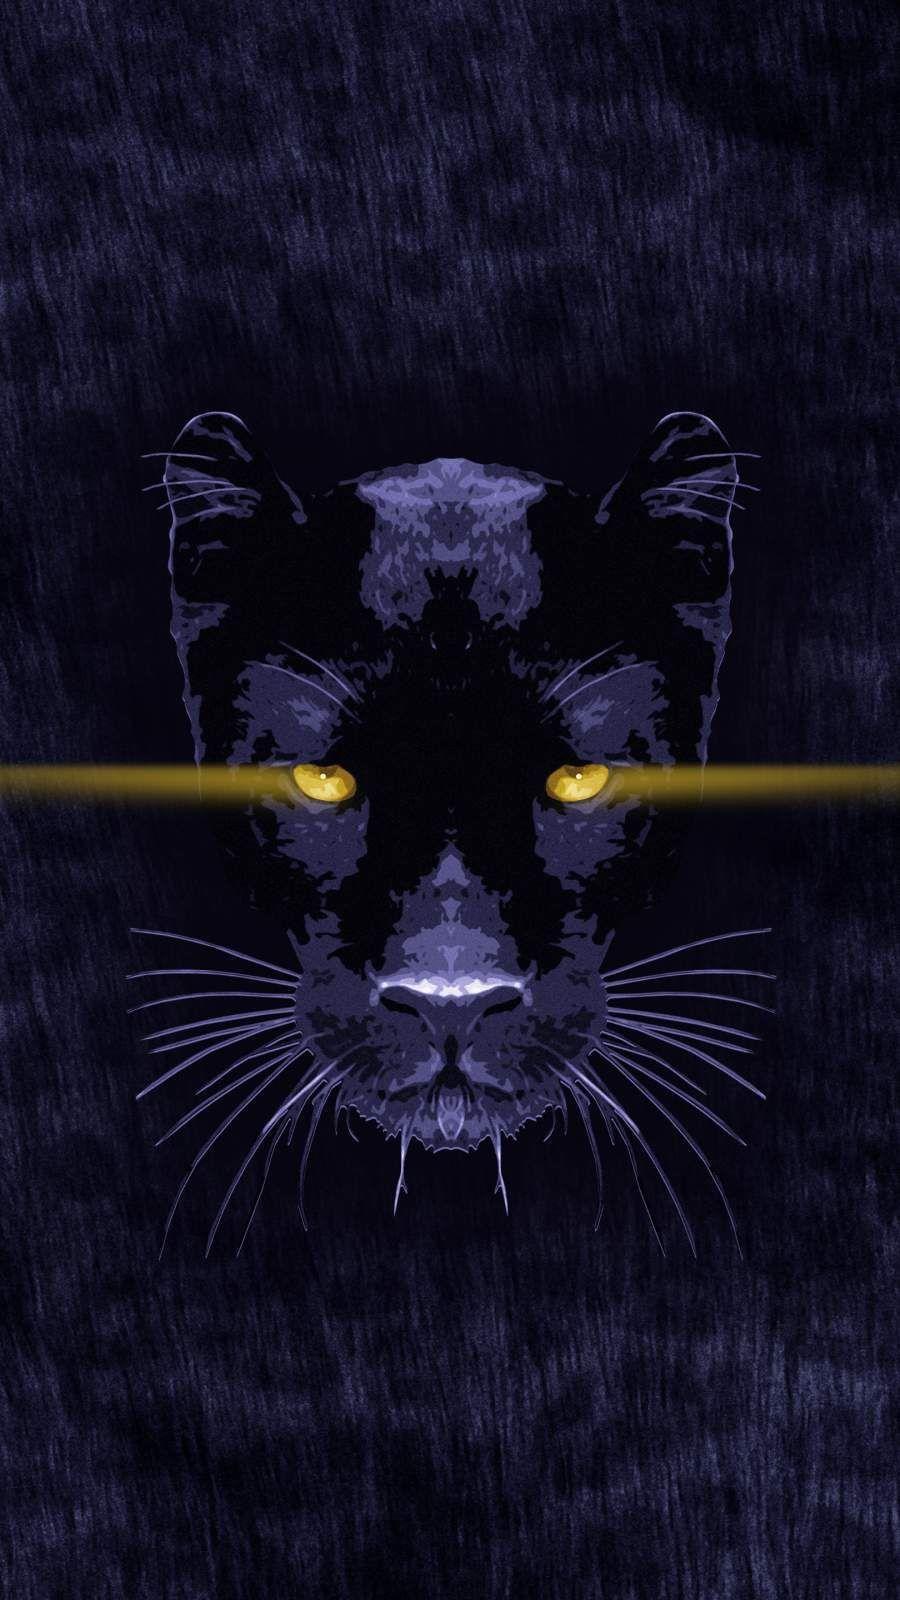 Cool Black Panther Animal Iphone Wallpapers Top Free Cool Black Panther Animal Iphone Backgrounds Wallpaperaccess